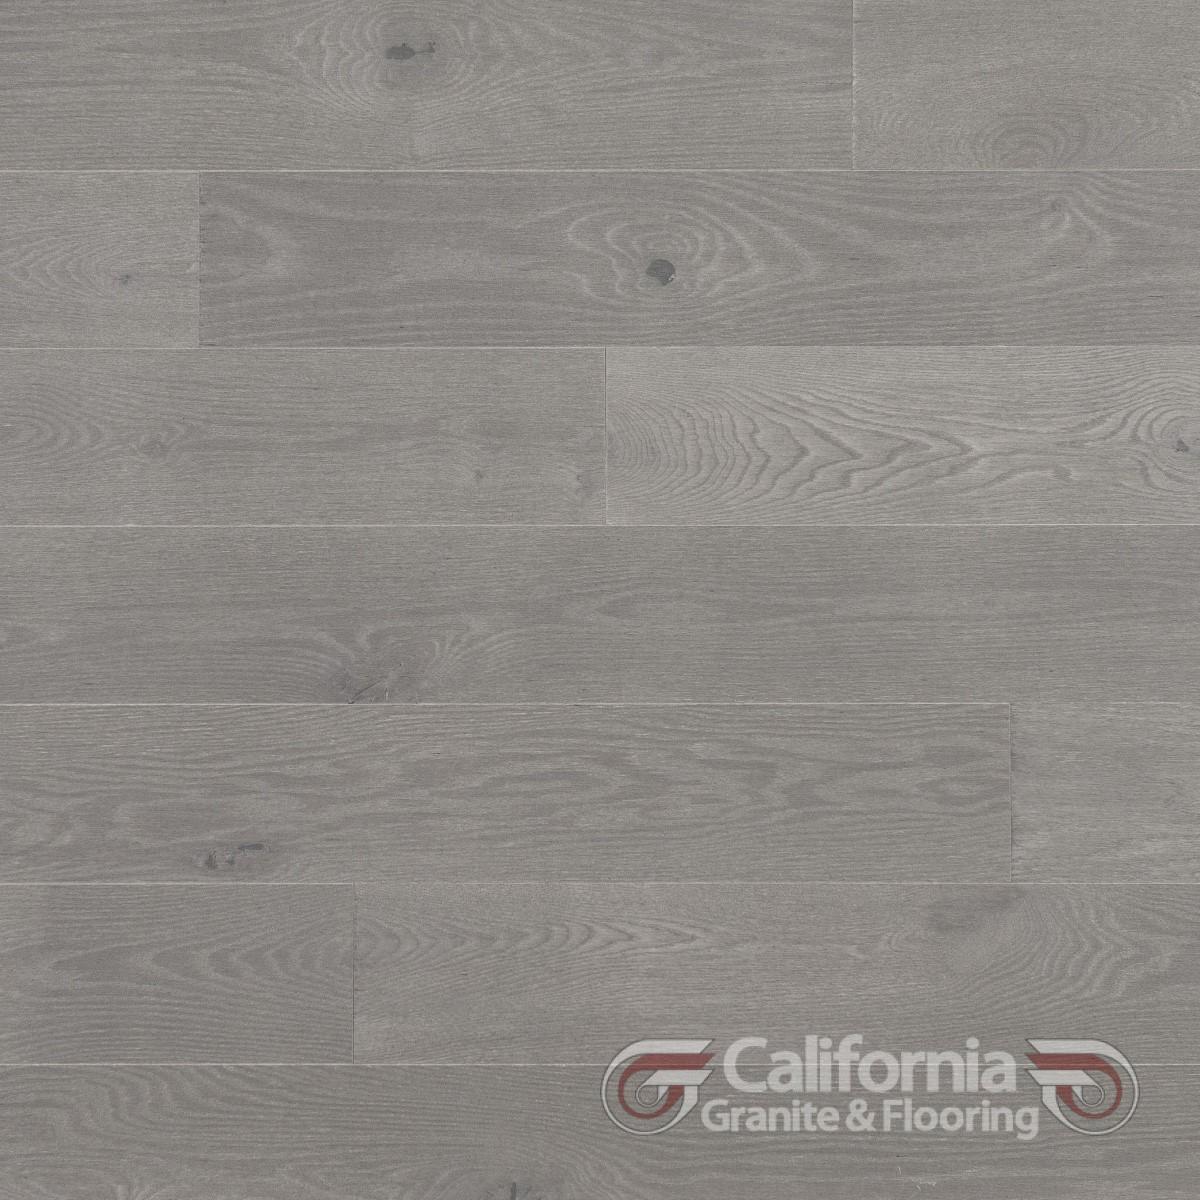 hardwood-flooring-red-oak-hopscotch-character-brushed-herringbone-2